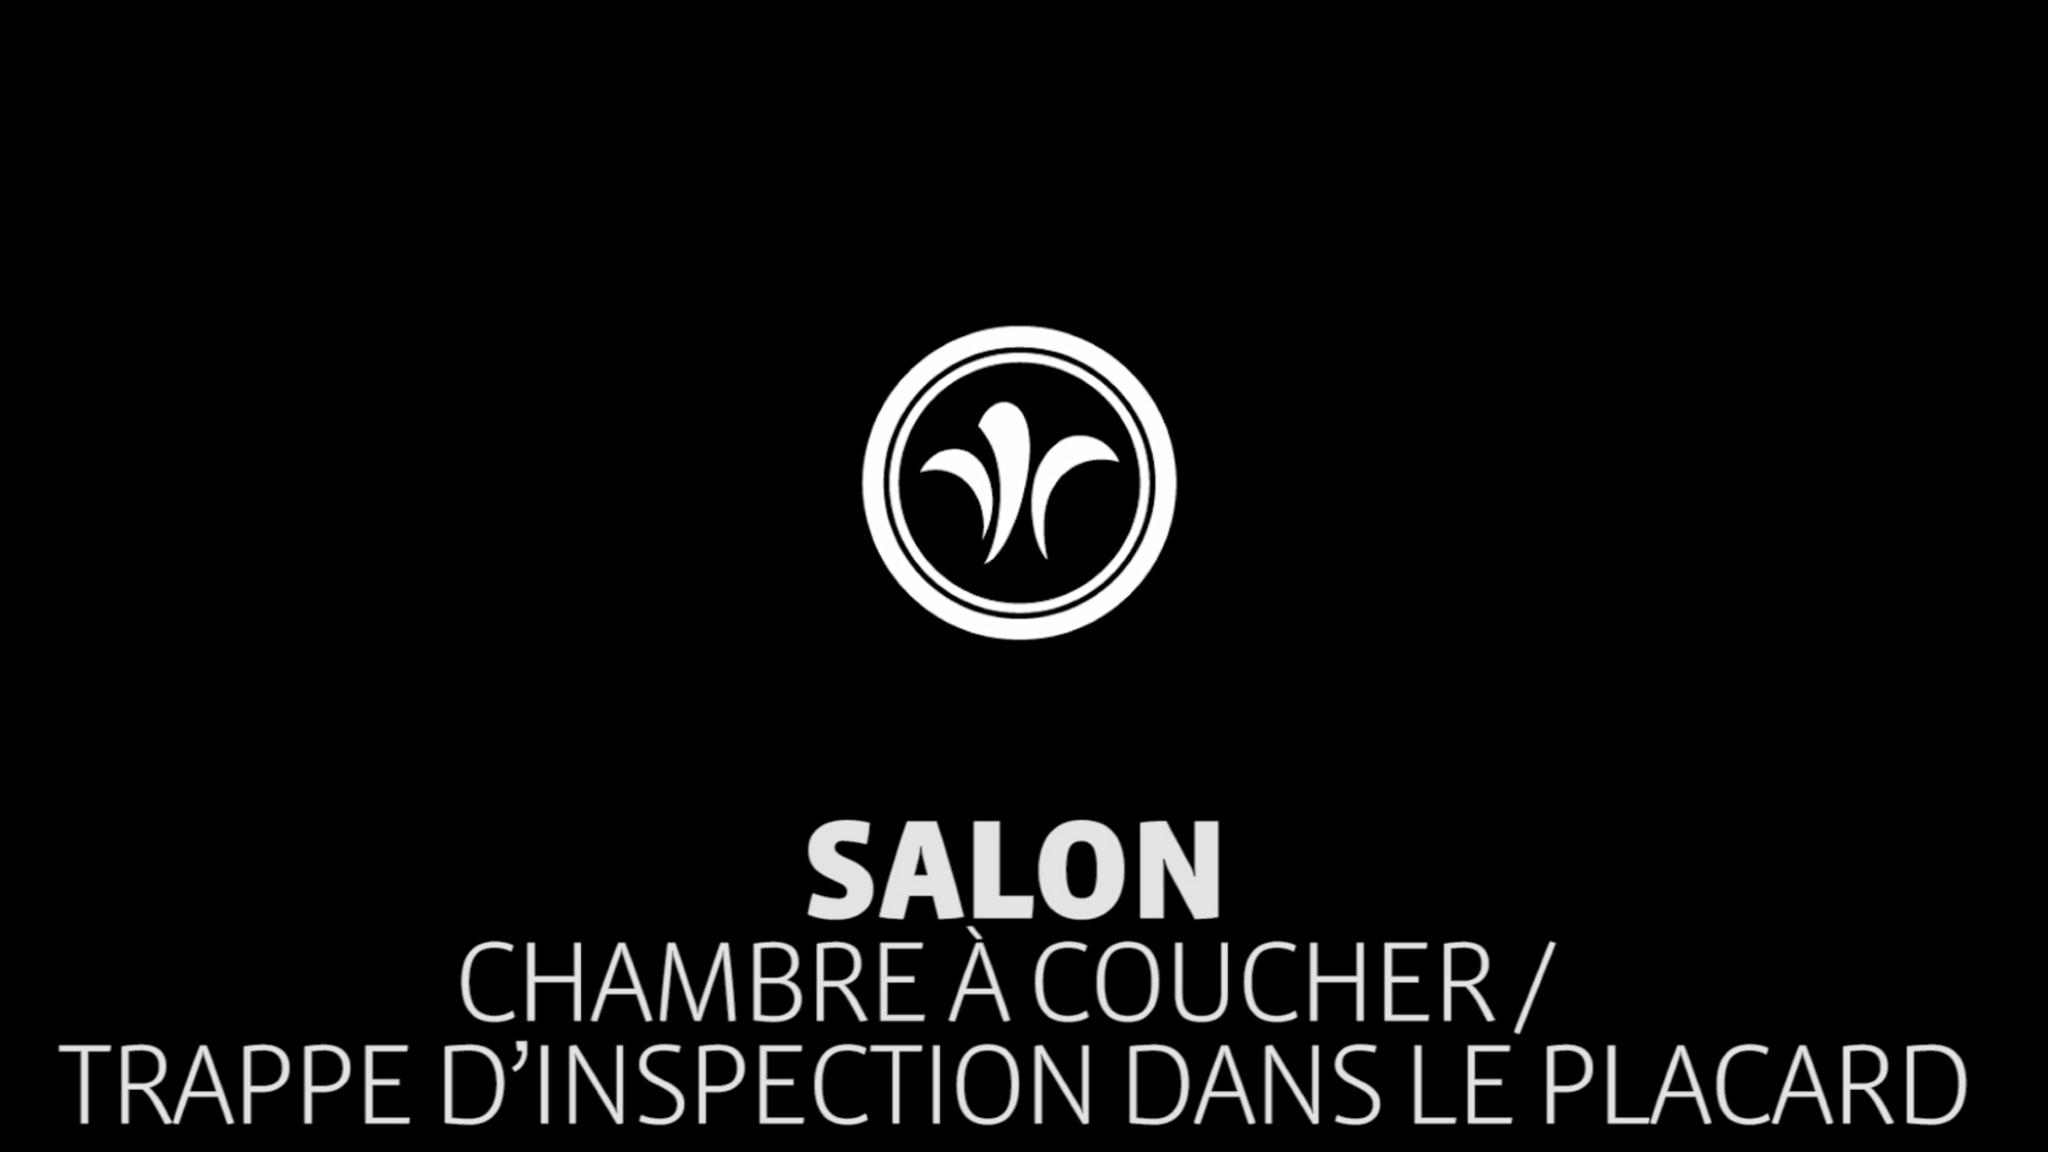 Volet d'inspection d'armoires // Niesmann+Bischoff - Camping-car de luxe (FLAIR) // 2019 // WO5